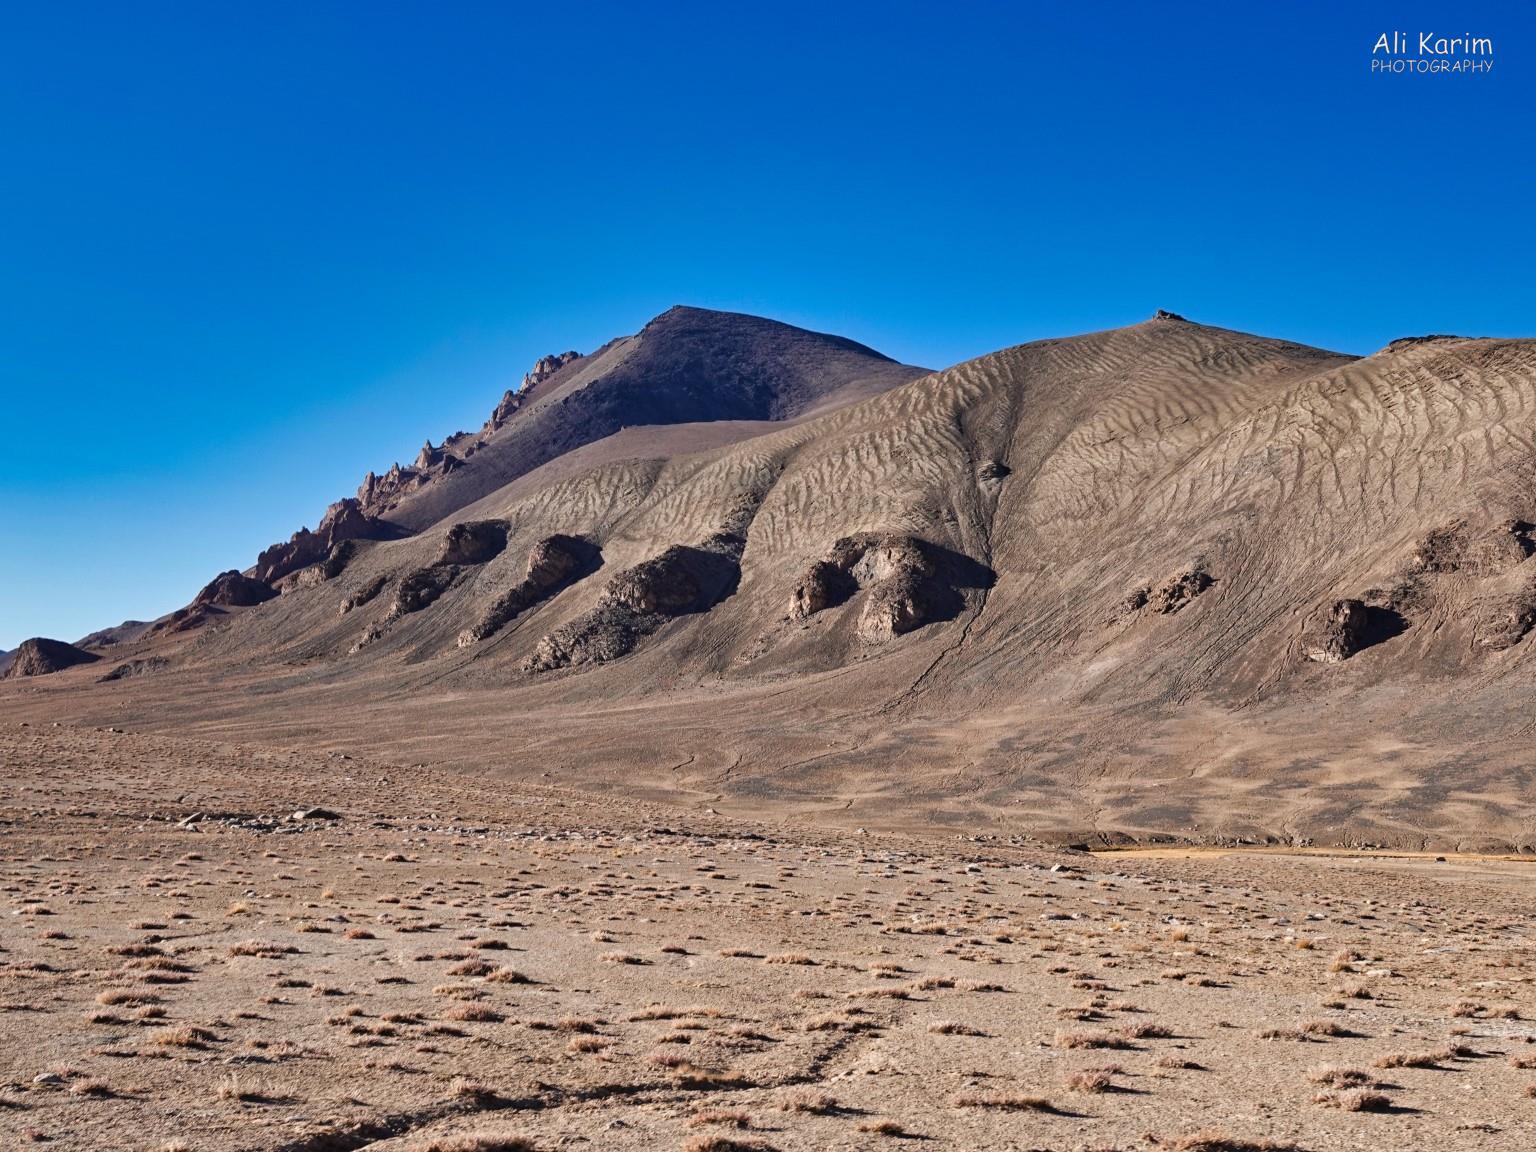 More Murghab & Alichur, Tajikistan, Weird landscapes